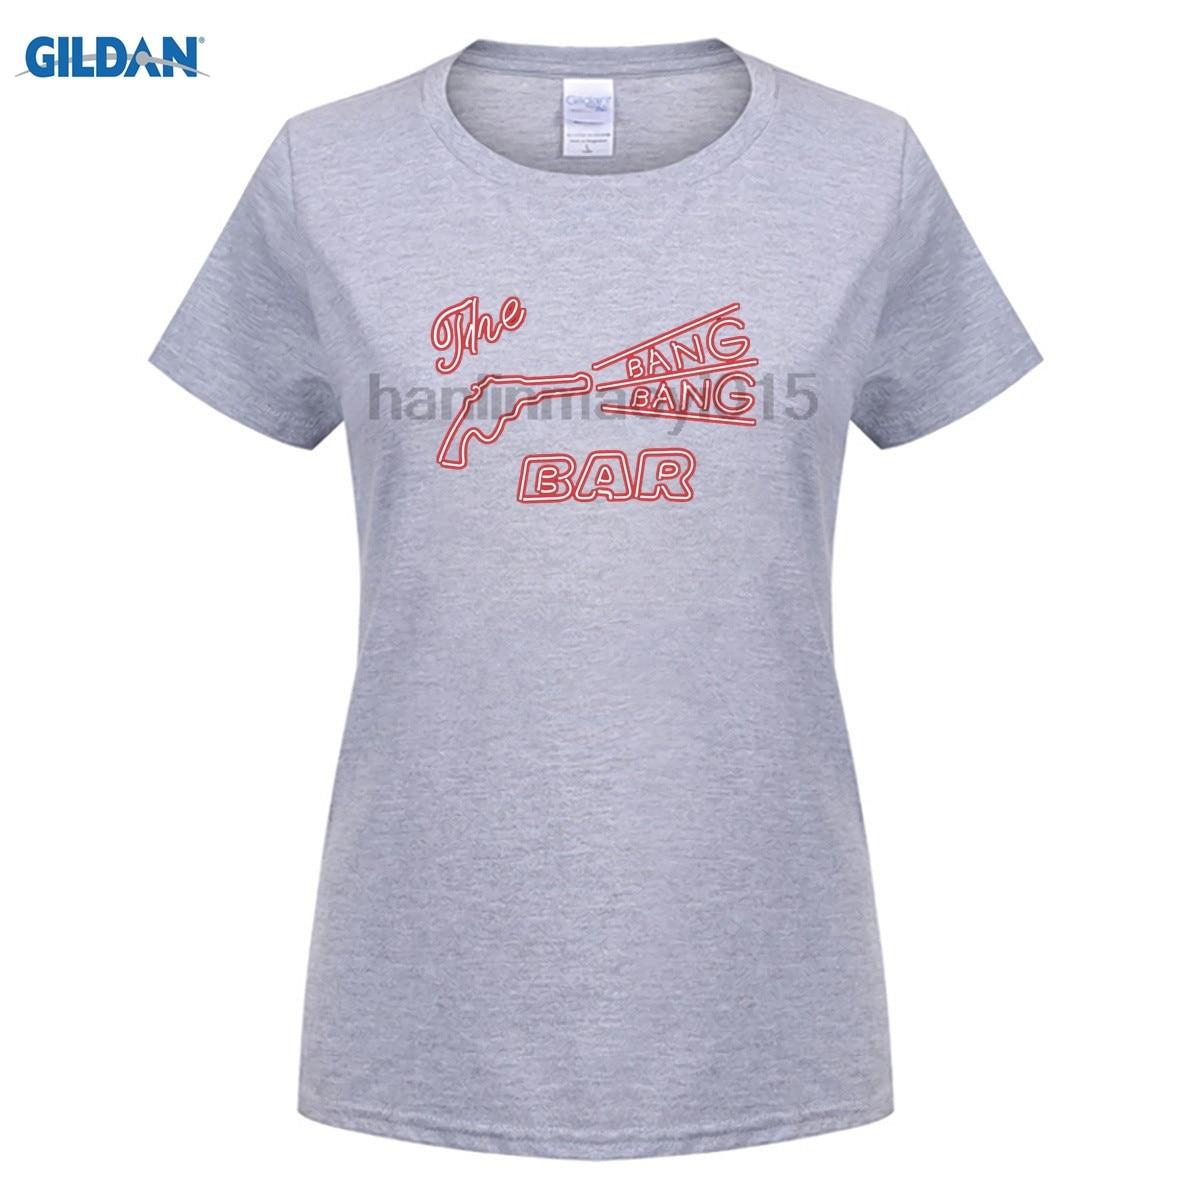 GILDAN 100% cotton O-neck printed T-shirt The Original BANG BANG BAR - Twin Peaks T-Shirt for women